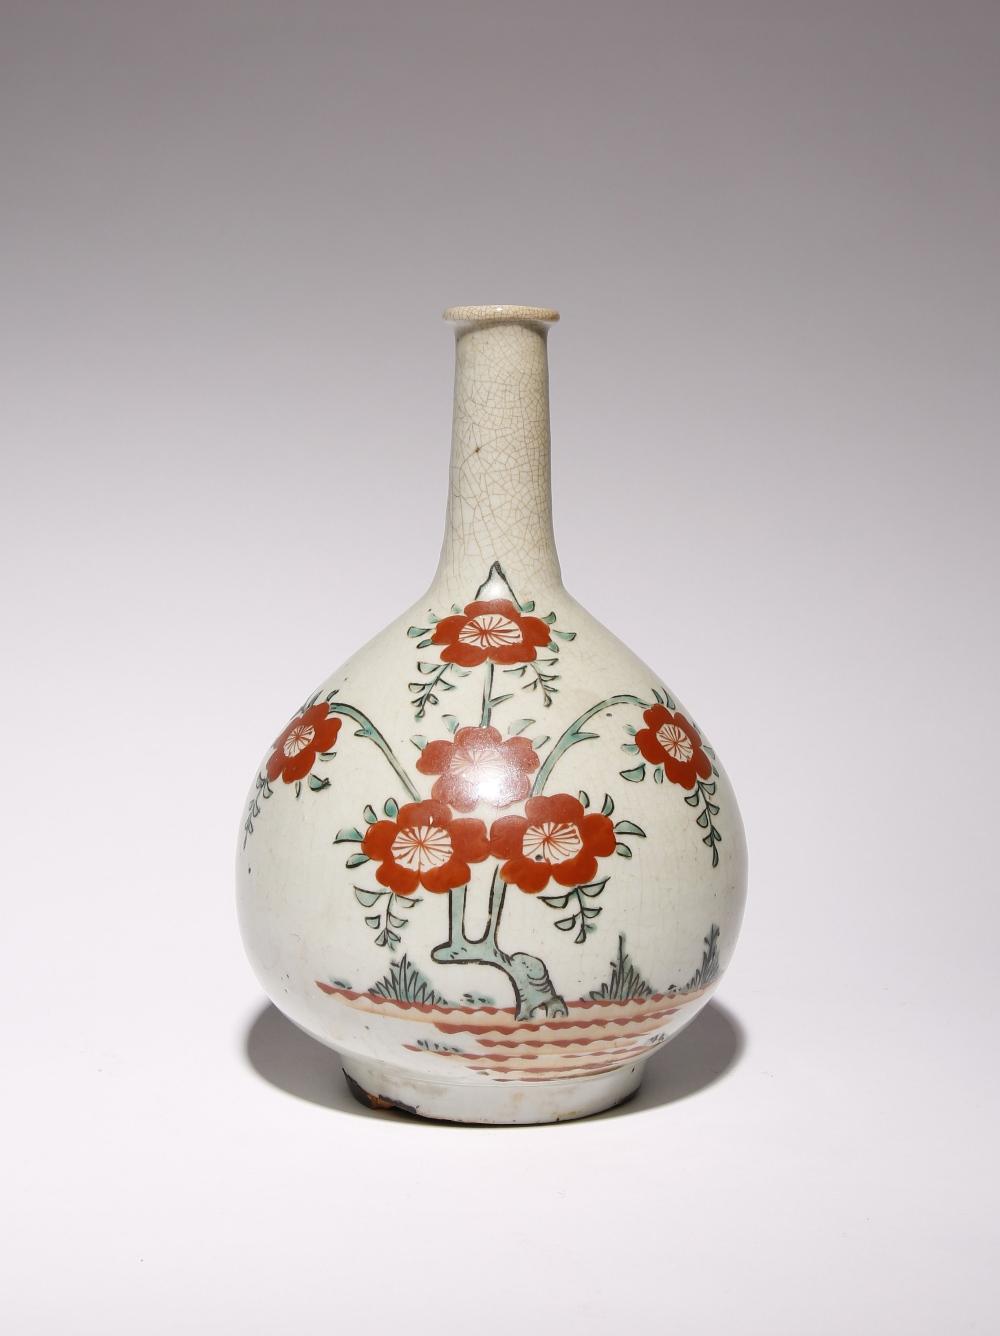 A JAPANESE ARITA BOTTLE VASE EDO PERIOD, 17TH OR 18TH CENTURY Possibly Ko-Imari, the bulbous body